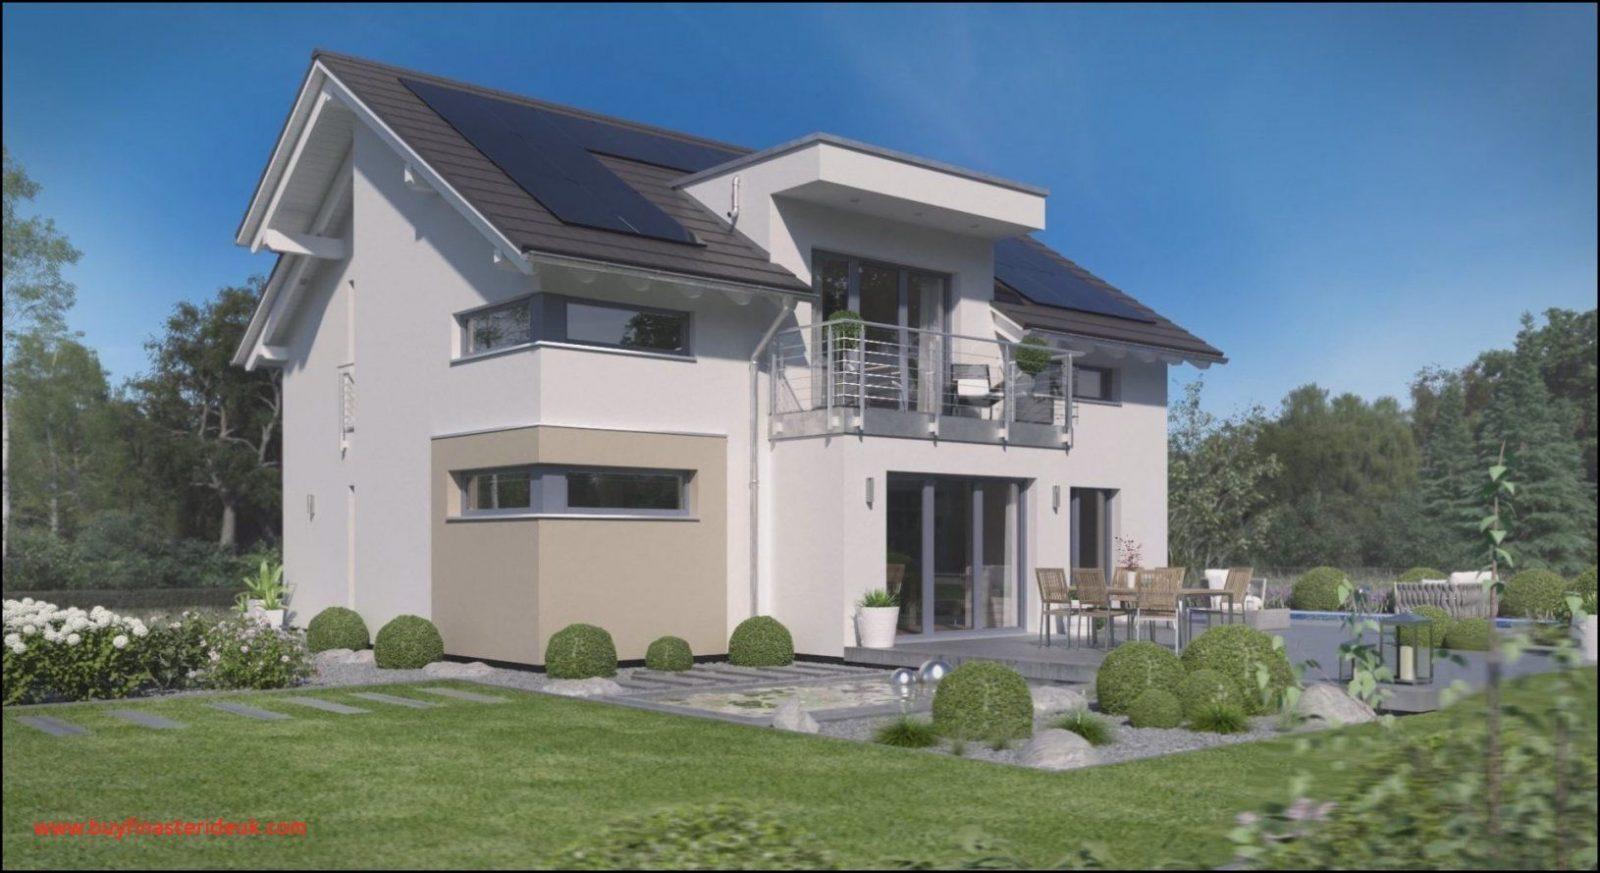 5 Beautiful Plan Haus Kaufen In Falkensee  Wallpaper Farbe Ideen von Haus Kaufen In Falkensee Von Privat Bild